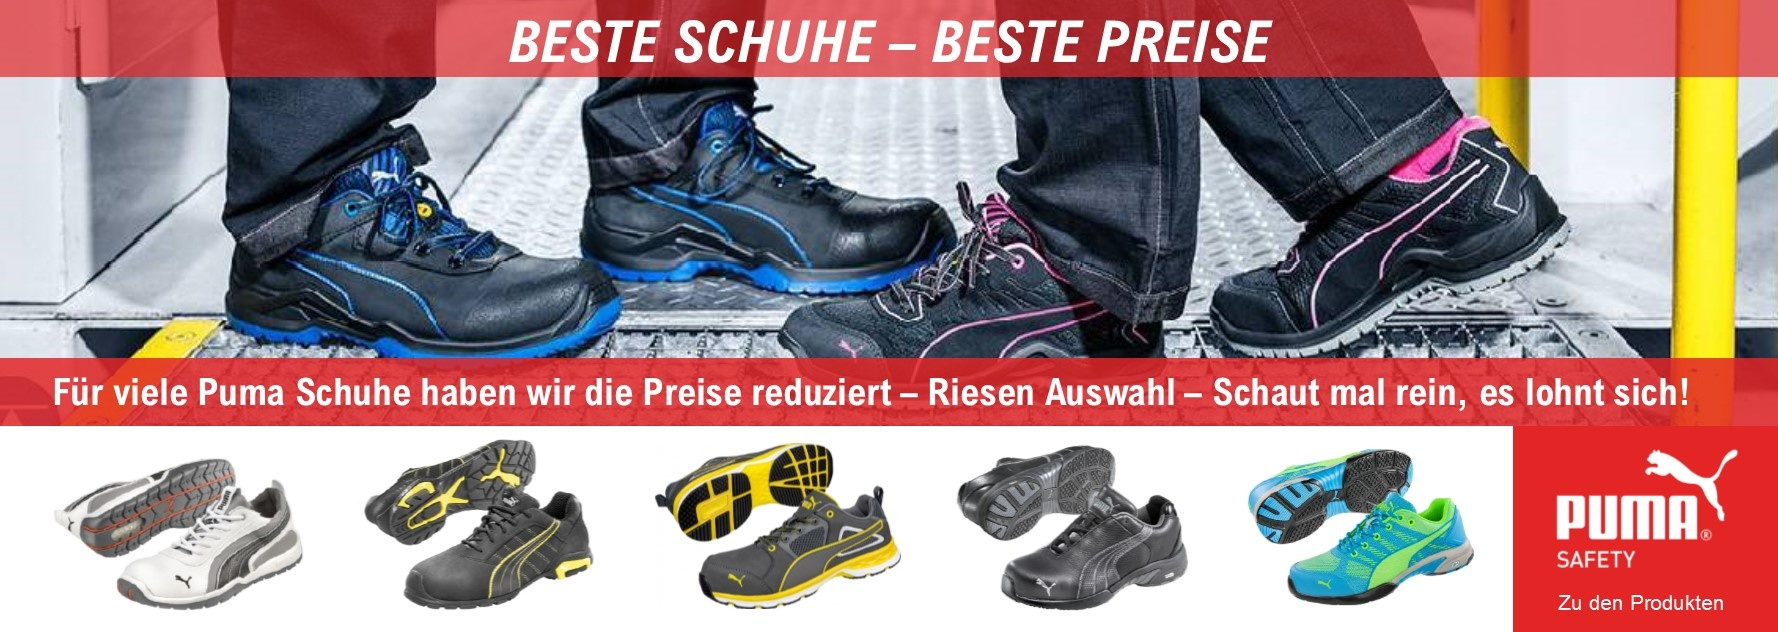 PUMA Schuhe Reduzierte Preise